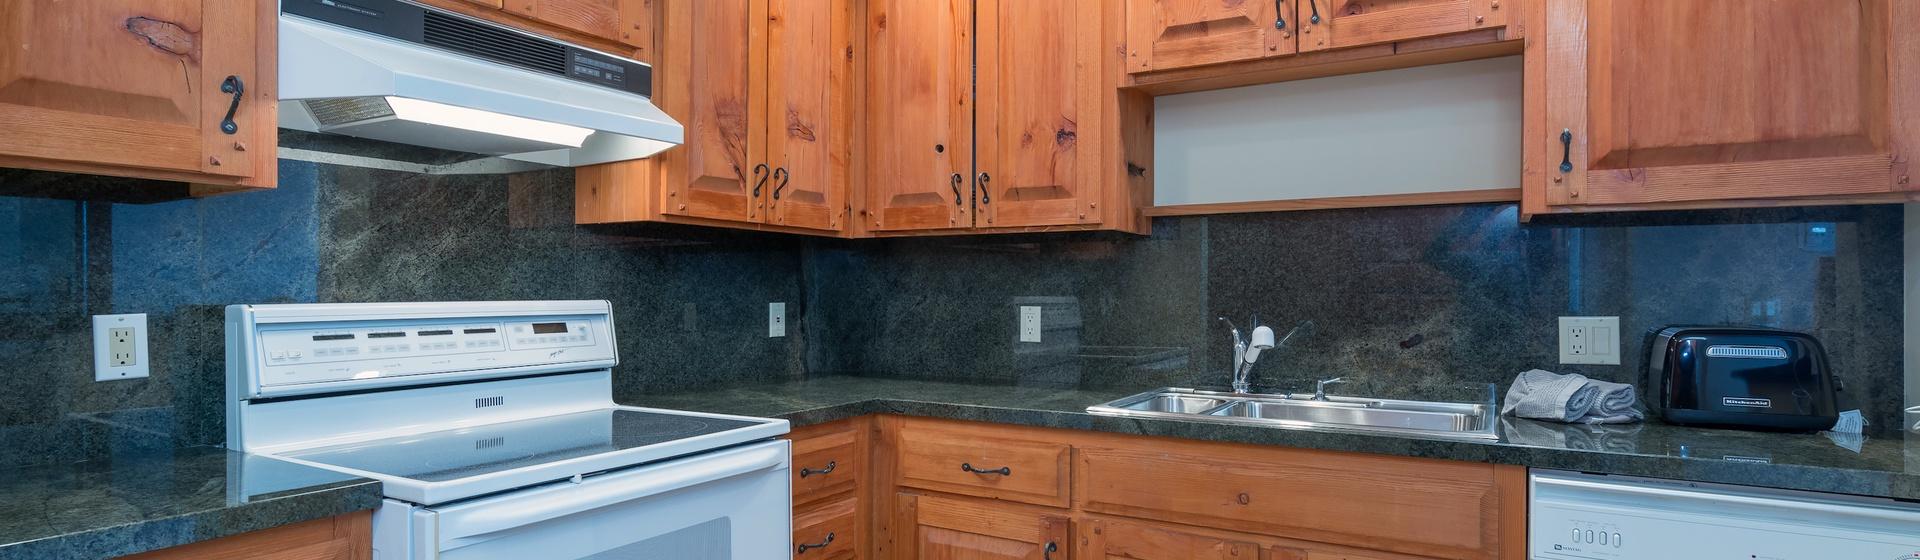 24-MountainVillage-Positive-Outlook-Caretakers-Kitchen-Web.jpg